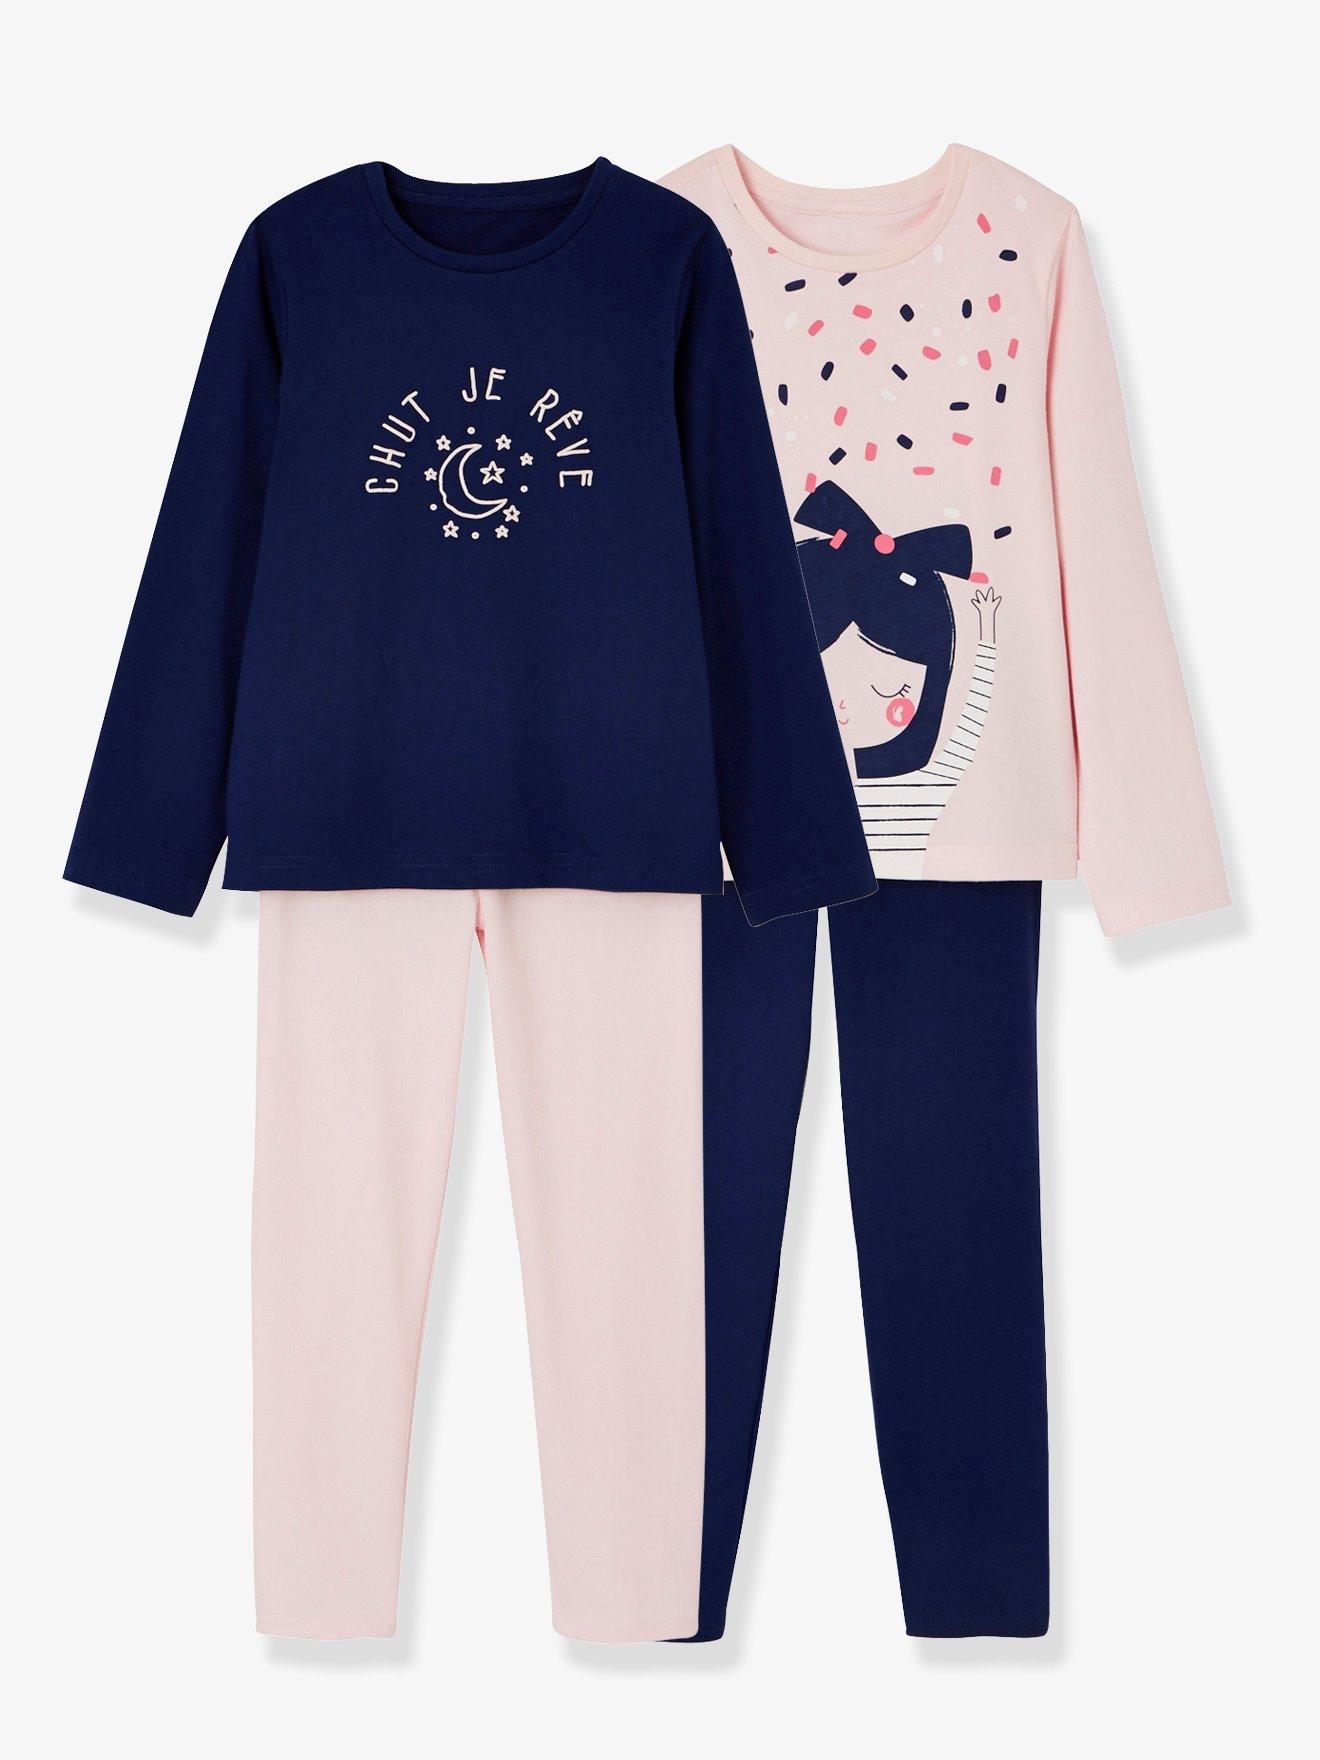 4961844ad Lote de 2 pijamas combinables para niña rosa claro liso con motivos